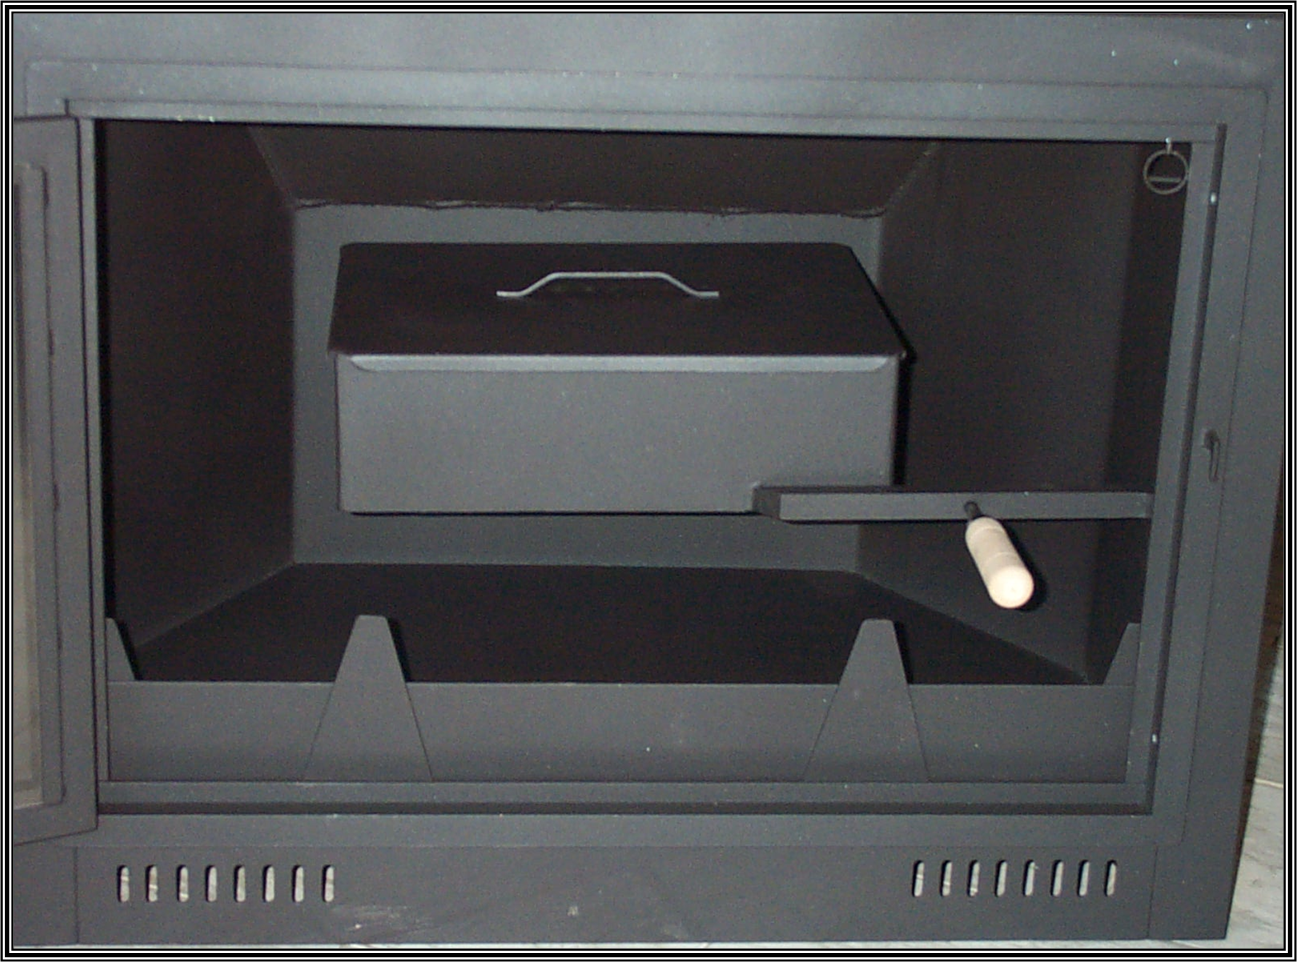 Chimeneas sierra horno de 40 x 30 para chimeneas - Rejillas para chimeneas ...